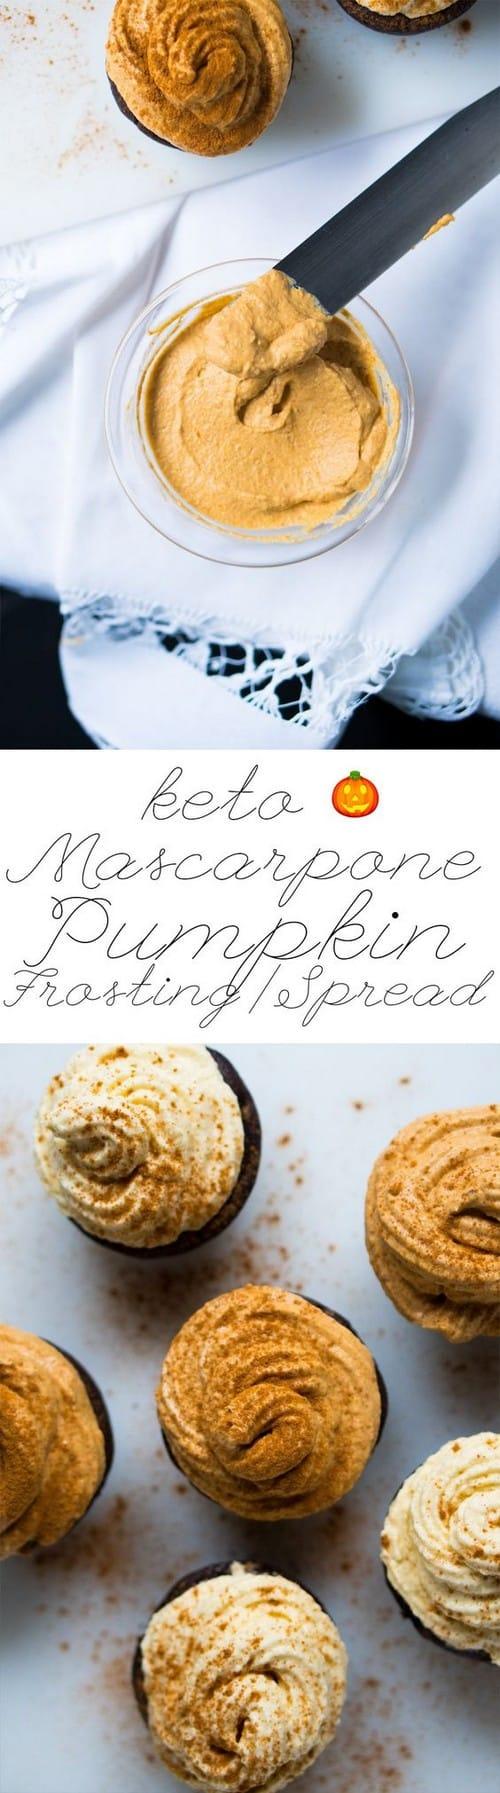 Keto Pumpkin Mascarpone Frosting